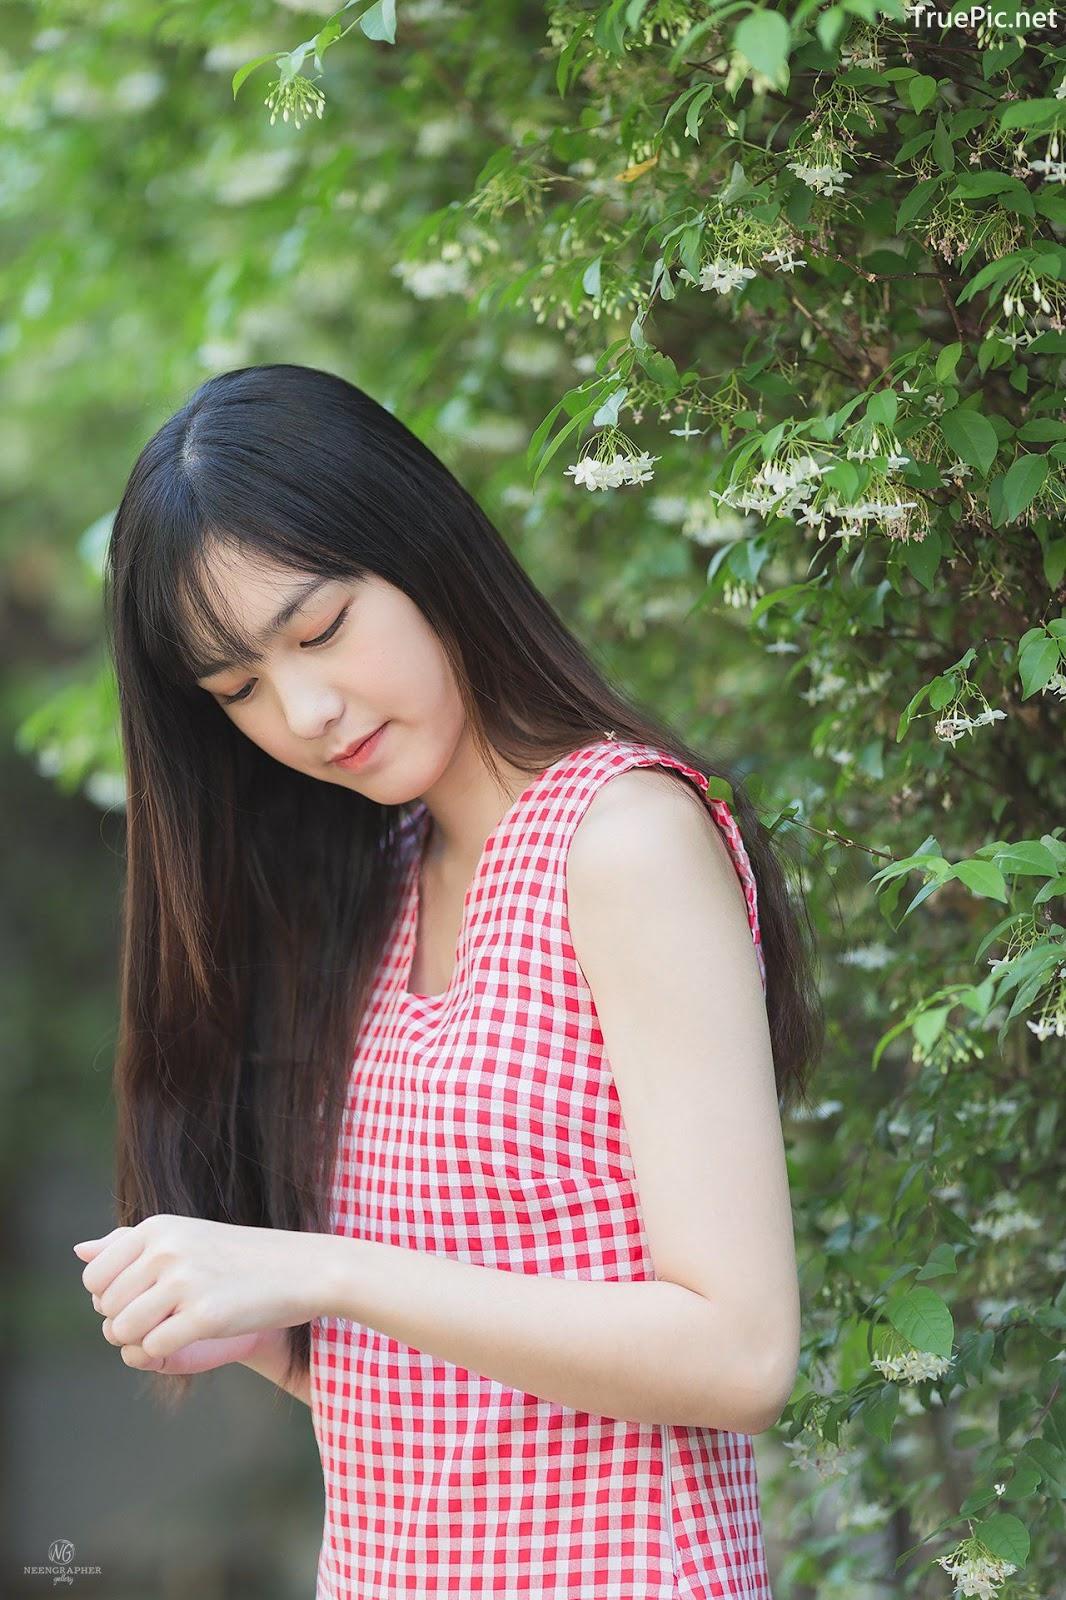 Image-Thailand-Cute-Model-Emma-Panisara–Album-Emma-Bright-Sunday-TruePic.net- Picture-8